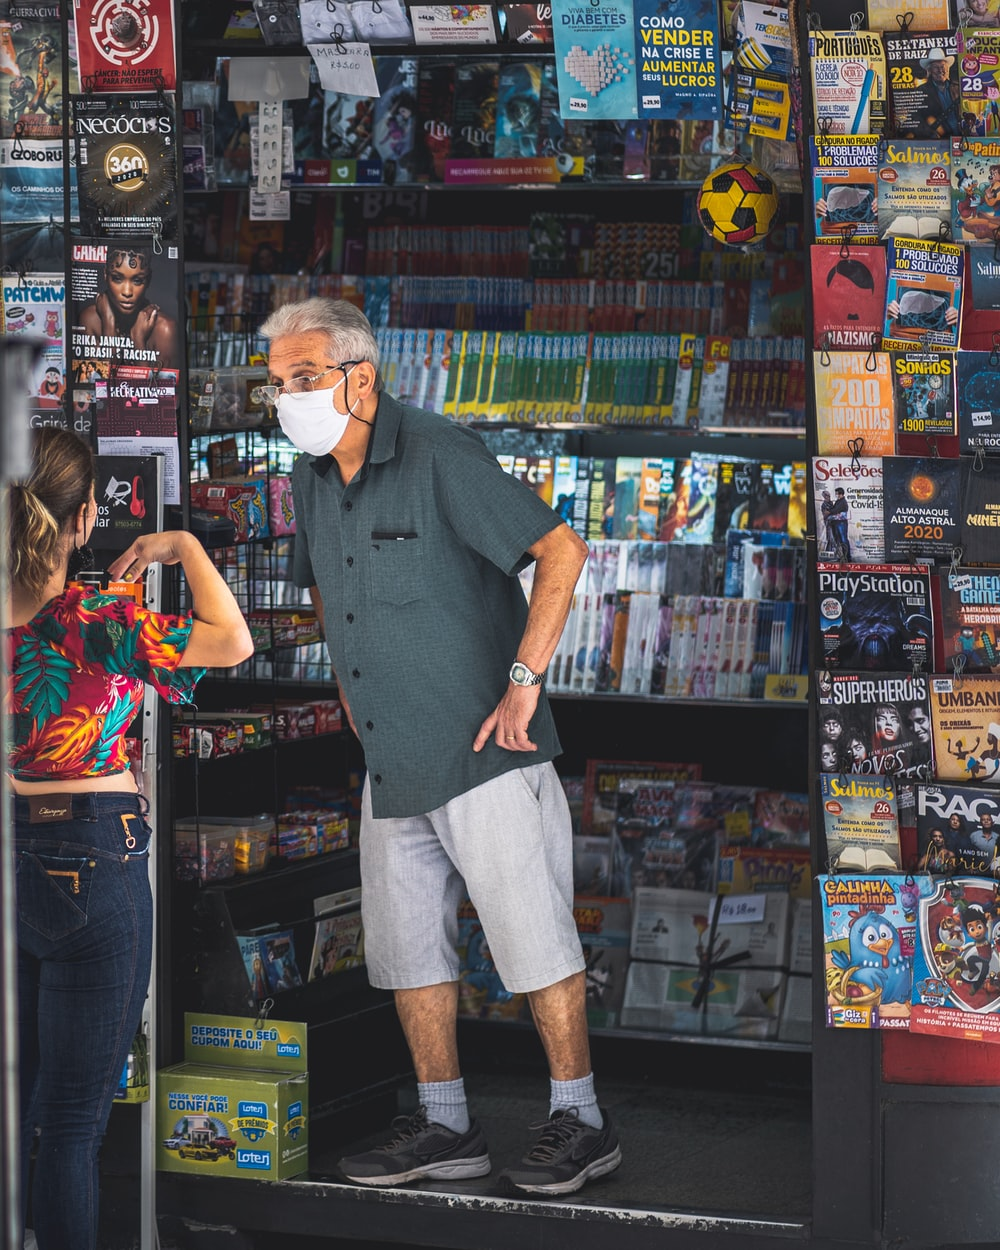 man in black button up shirt standing beside woman in blue sleeveless shirt